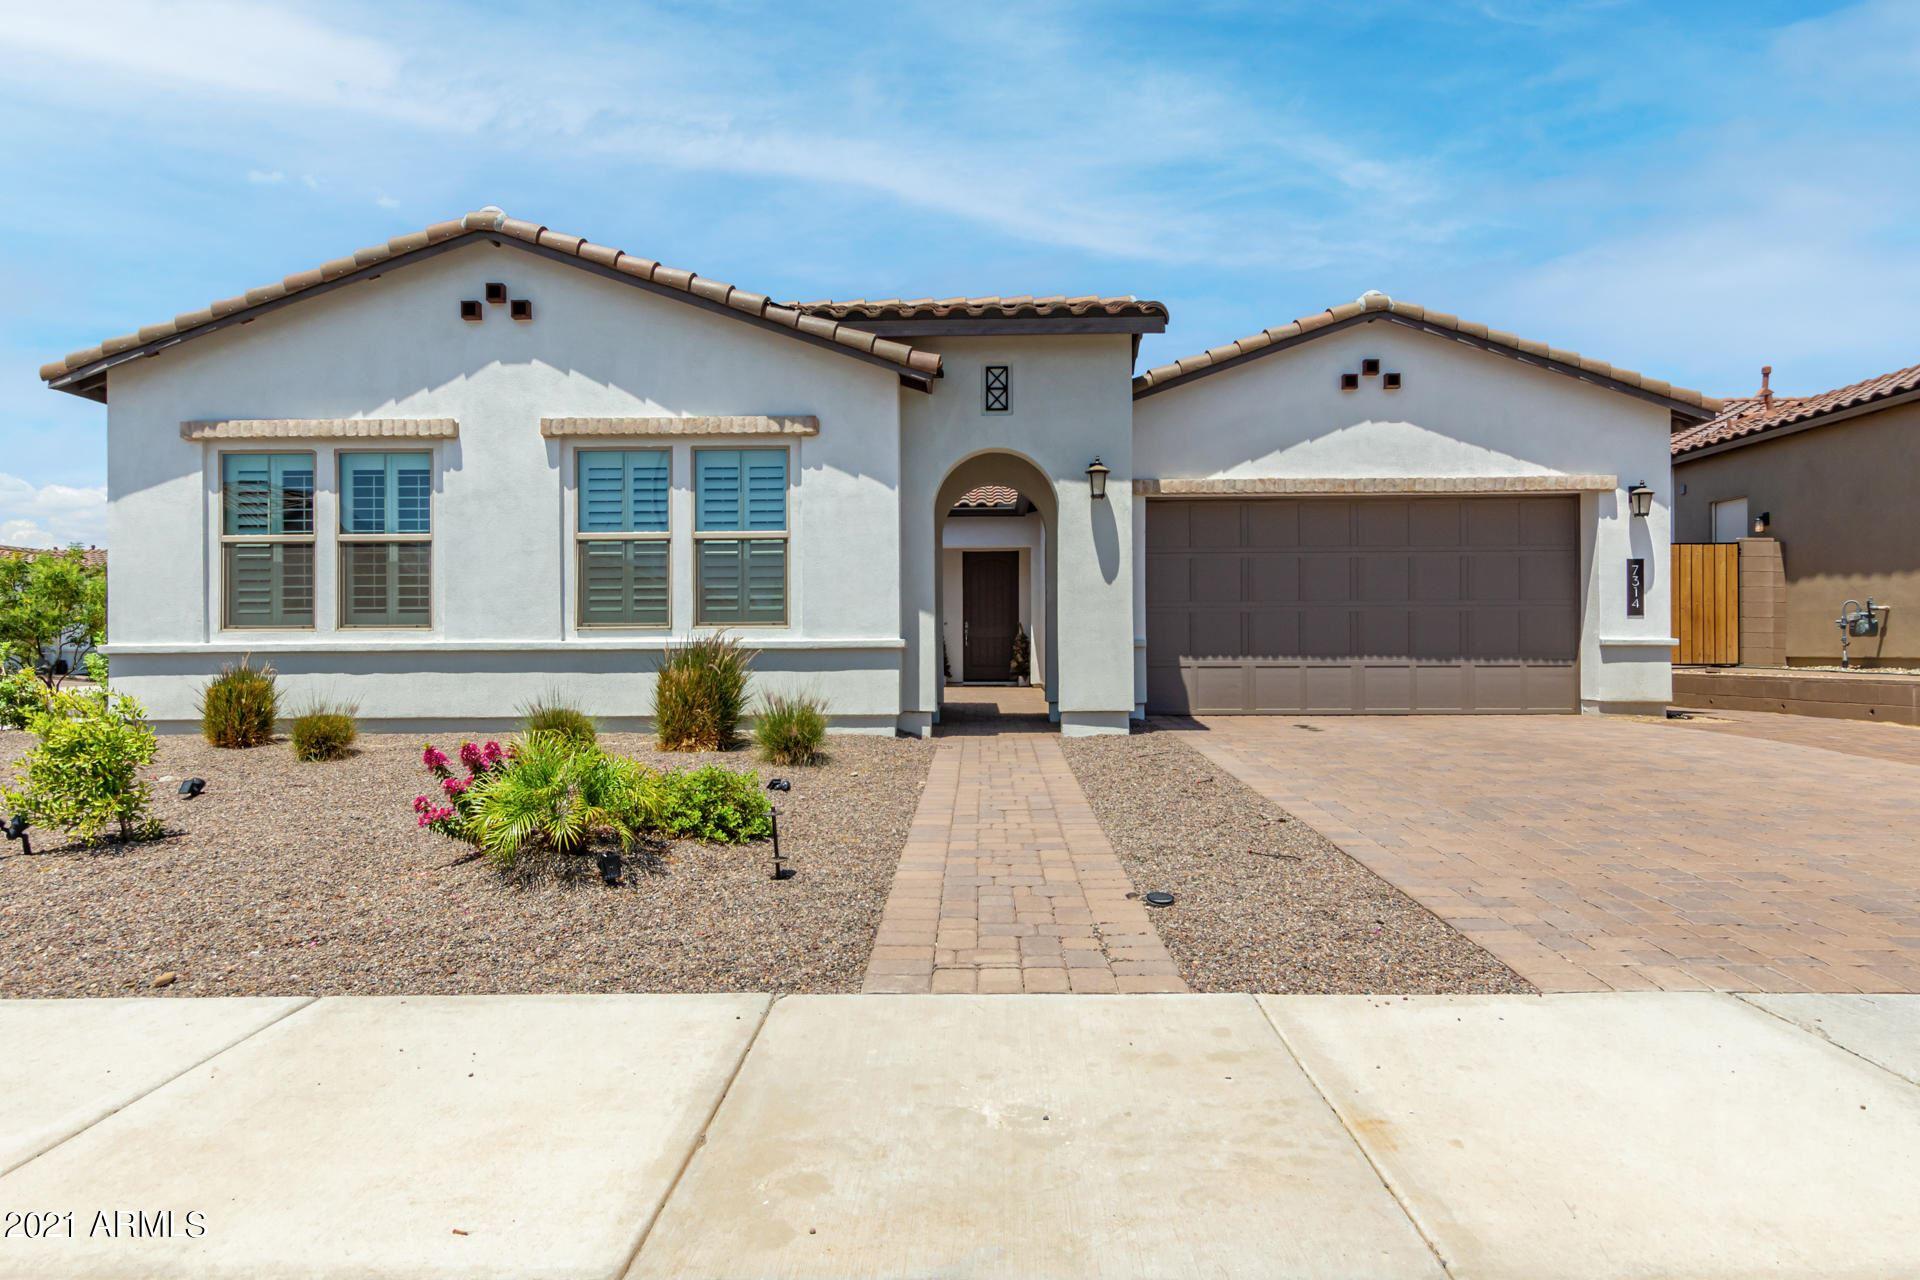 7314 W SPUR Drive, Peoria, AZ 85383 - MLS#: 6262206